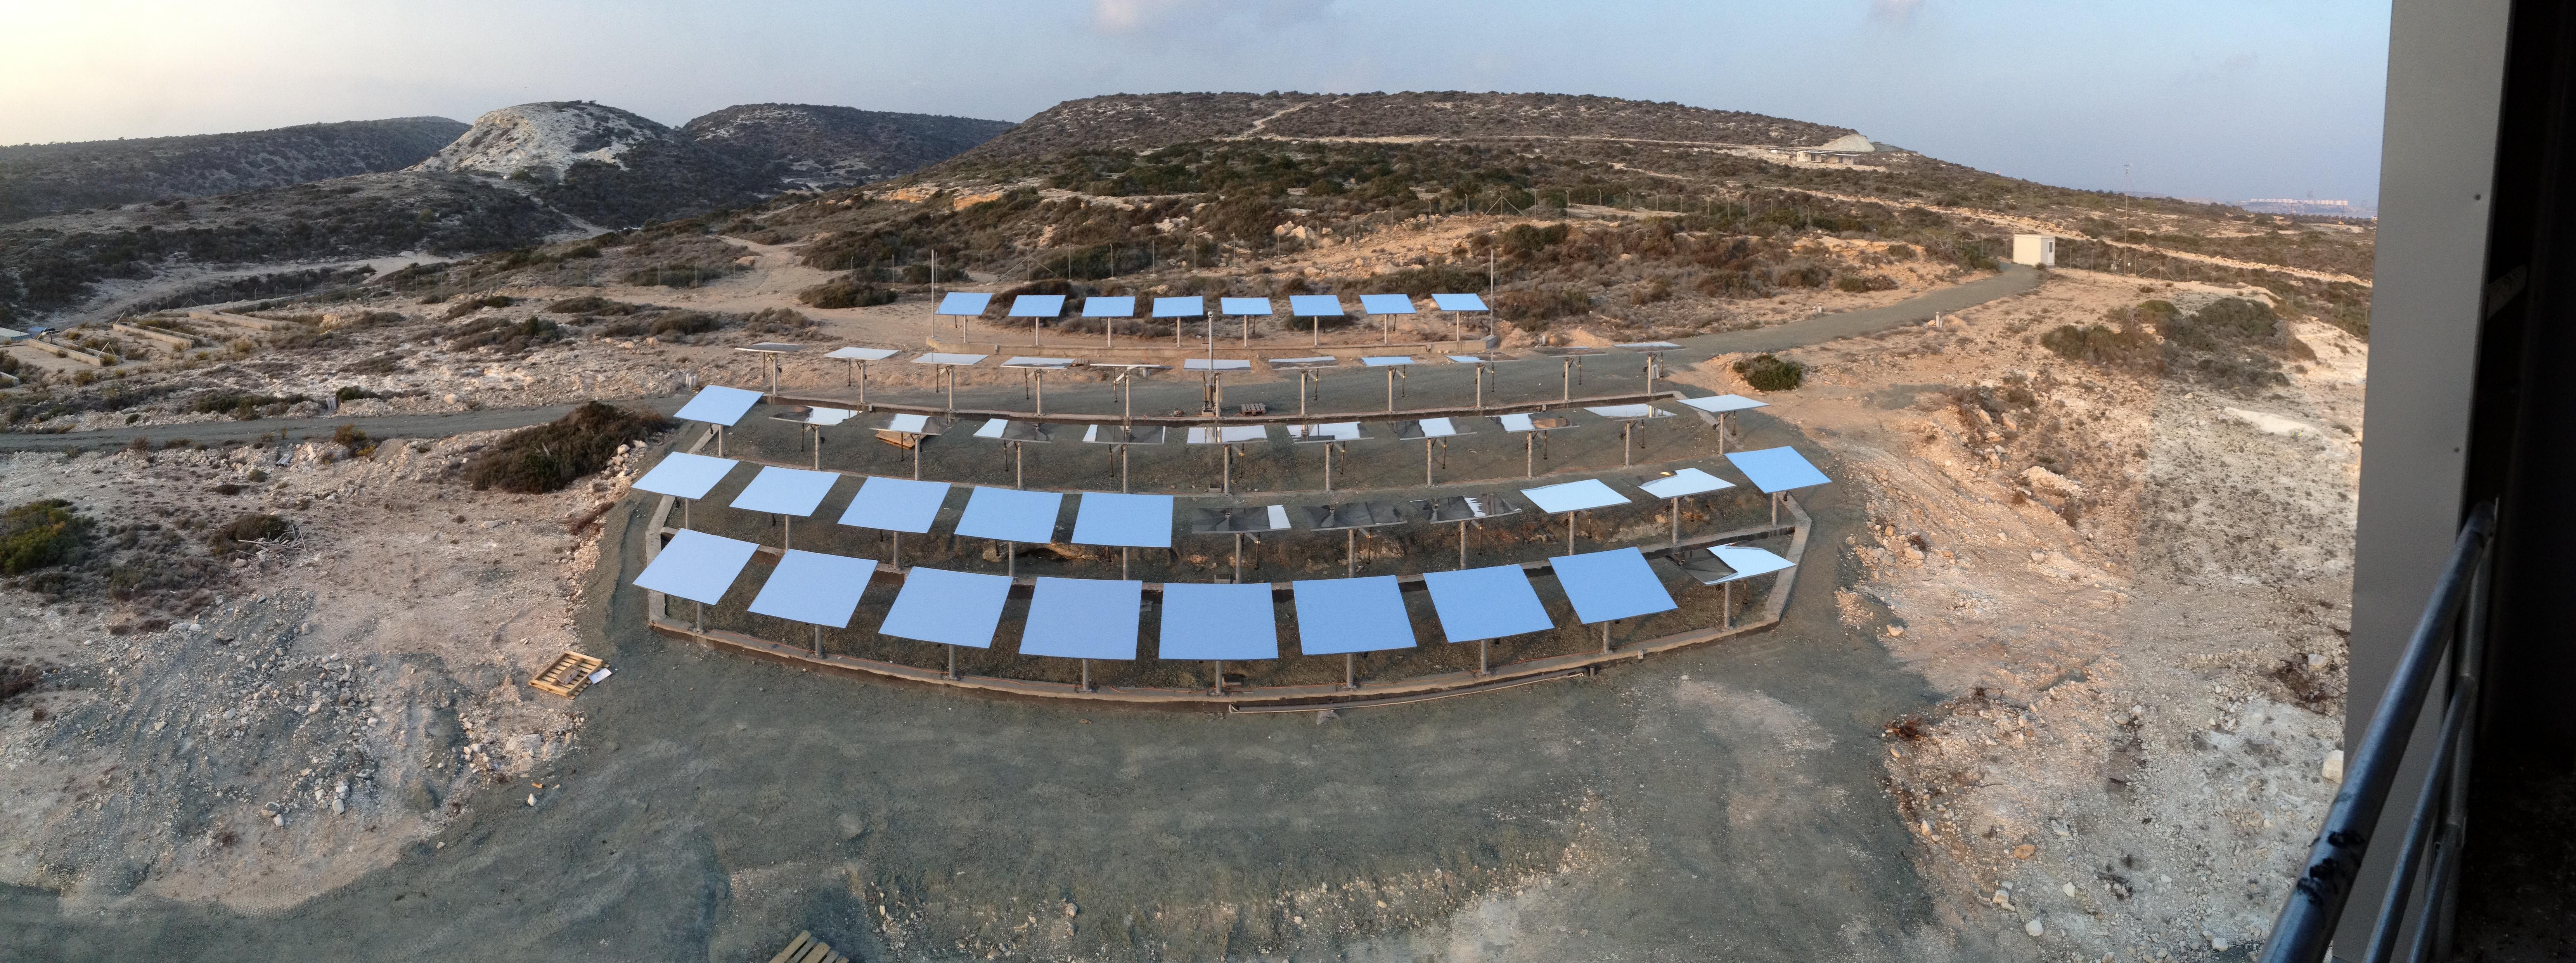 Solar field of dreams. Credit: Cyprus Institute